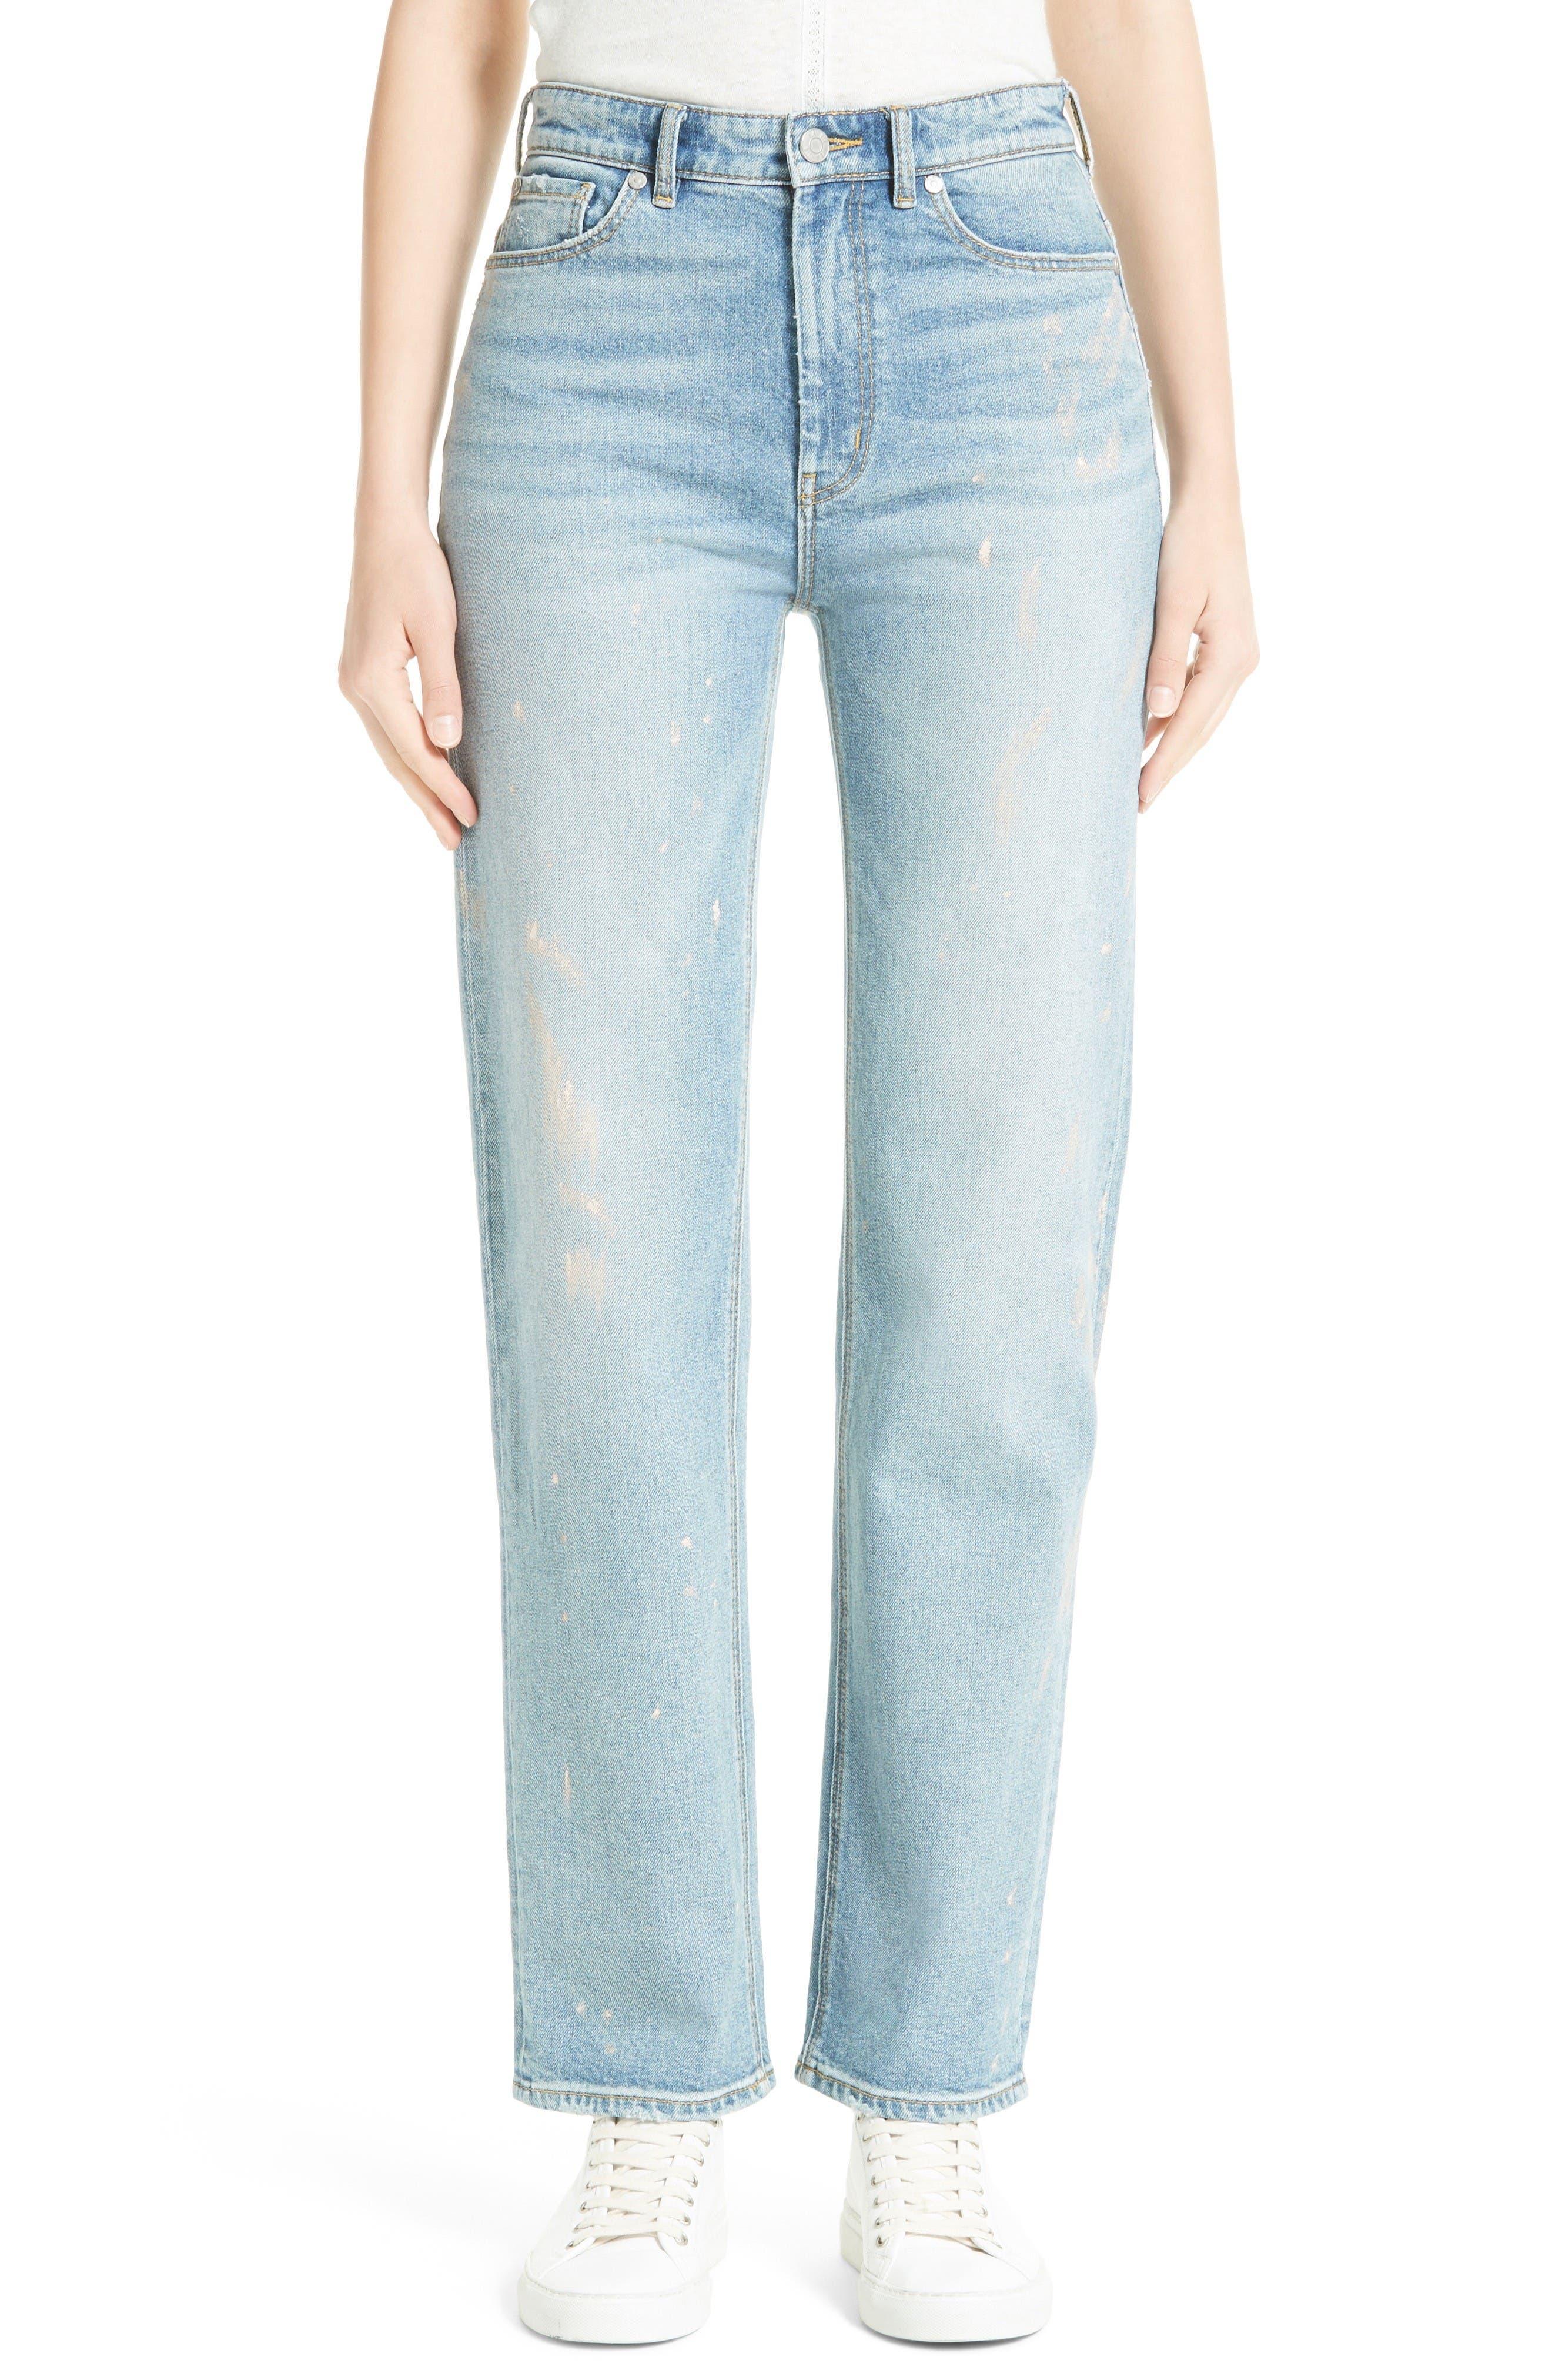 Alternate Image 1 Selected - La Vie Rebecca Taylor Paint Splatter Straight Leg Jeans